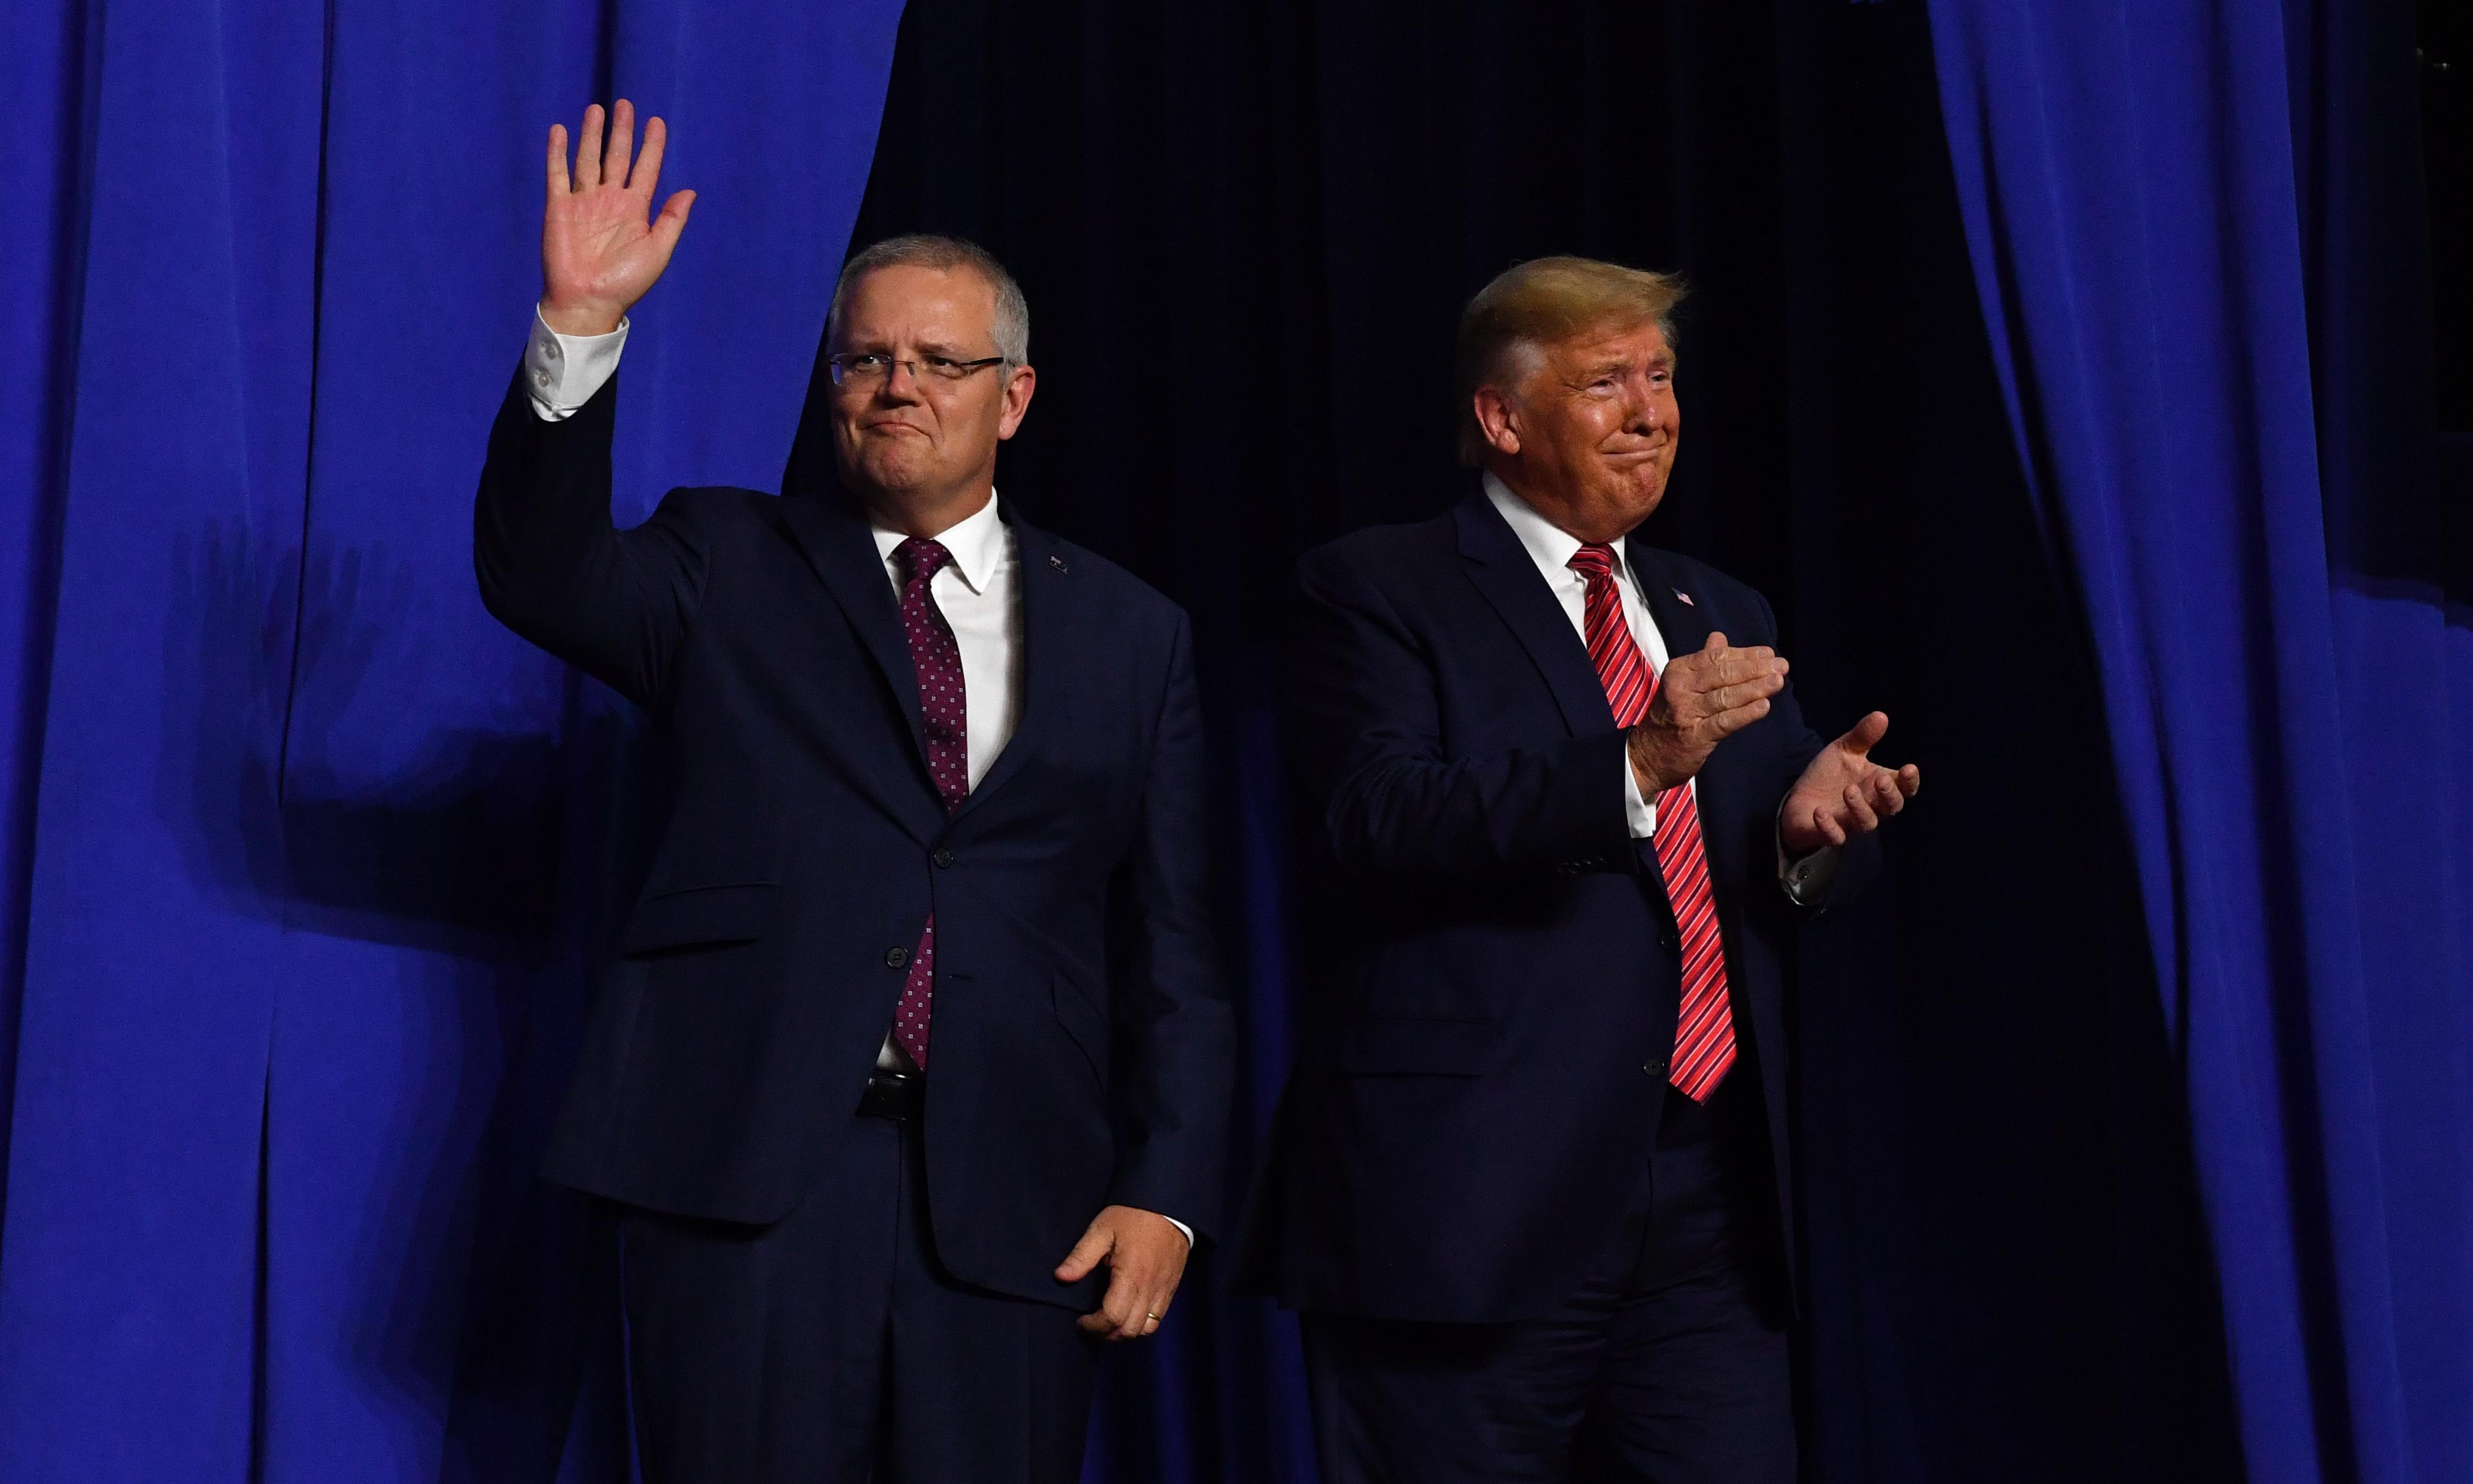 Scott Morrison ducks questions on Australia's emissions strategy for 2050